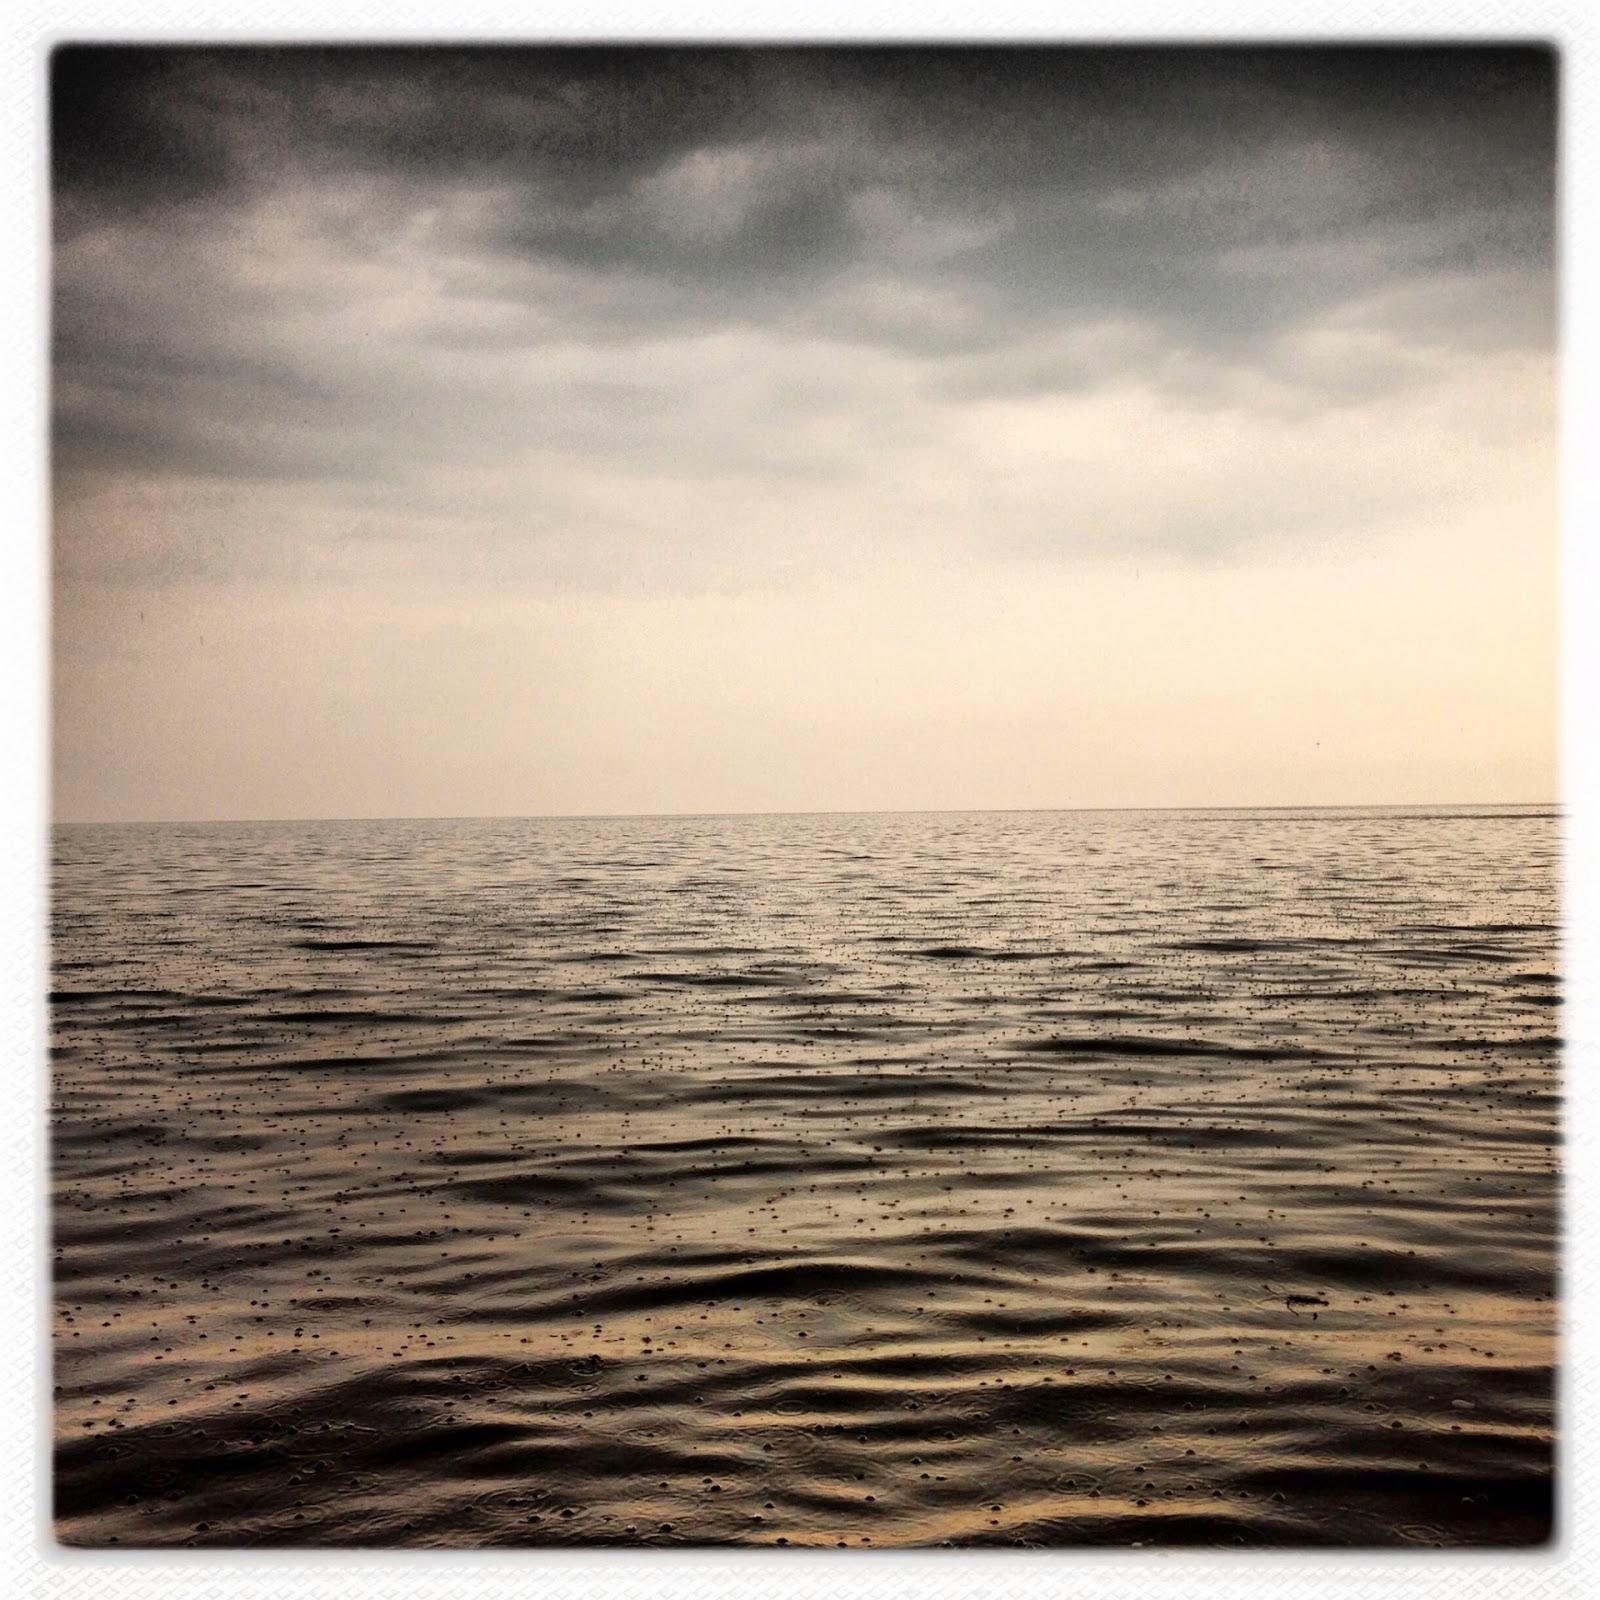 Photograph, Michael Christopher Brown: Rain.